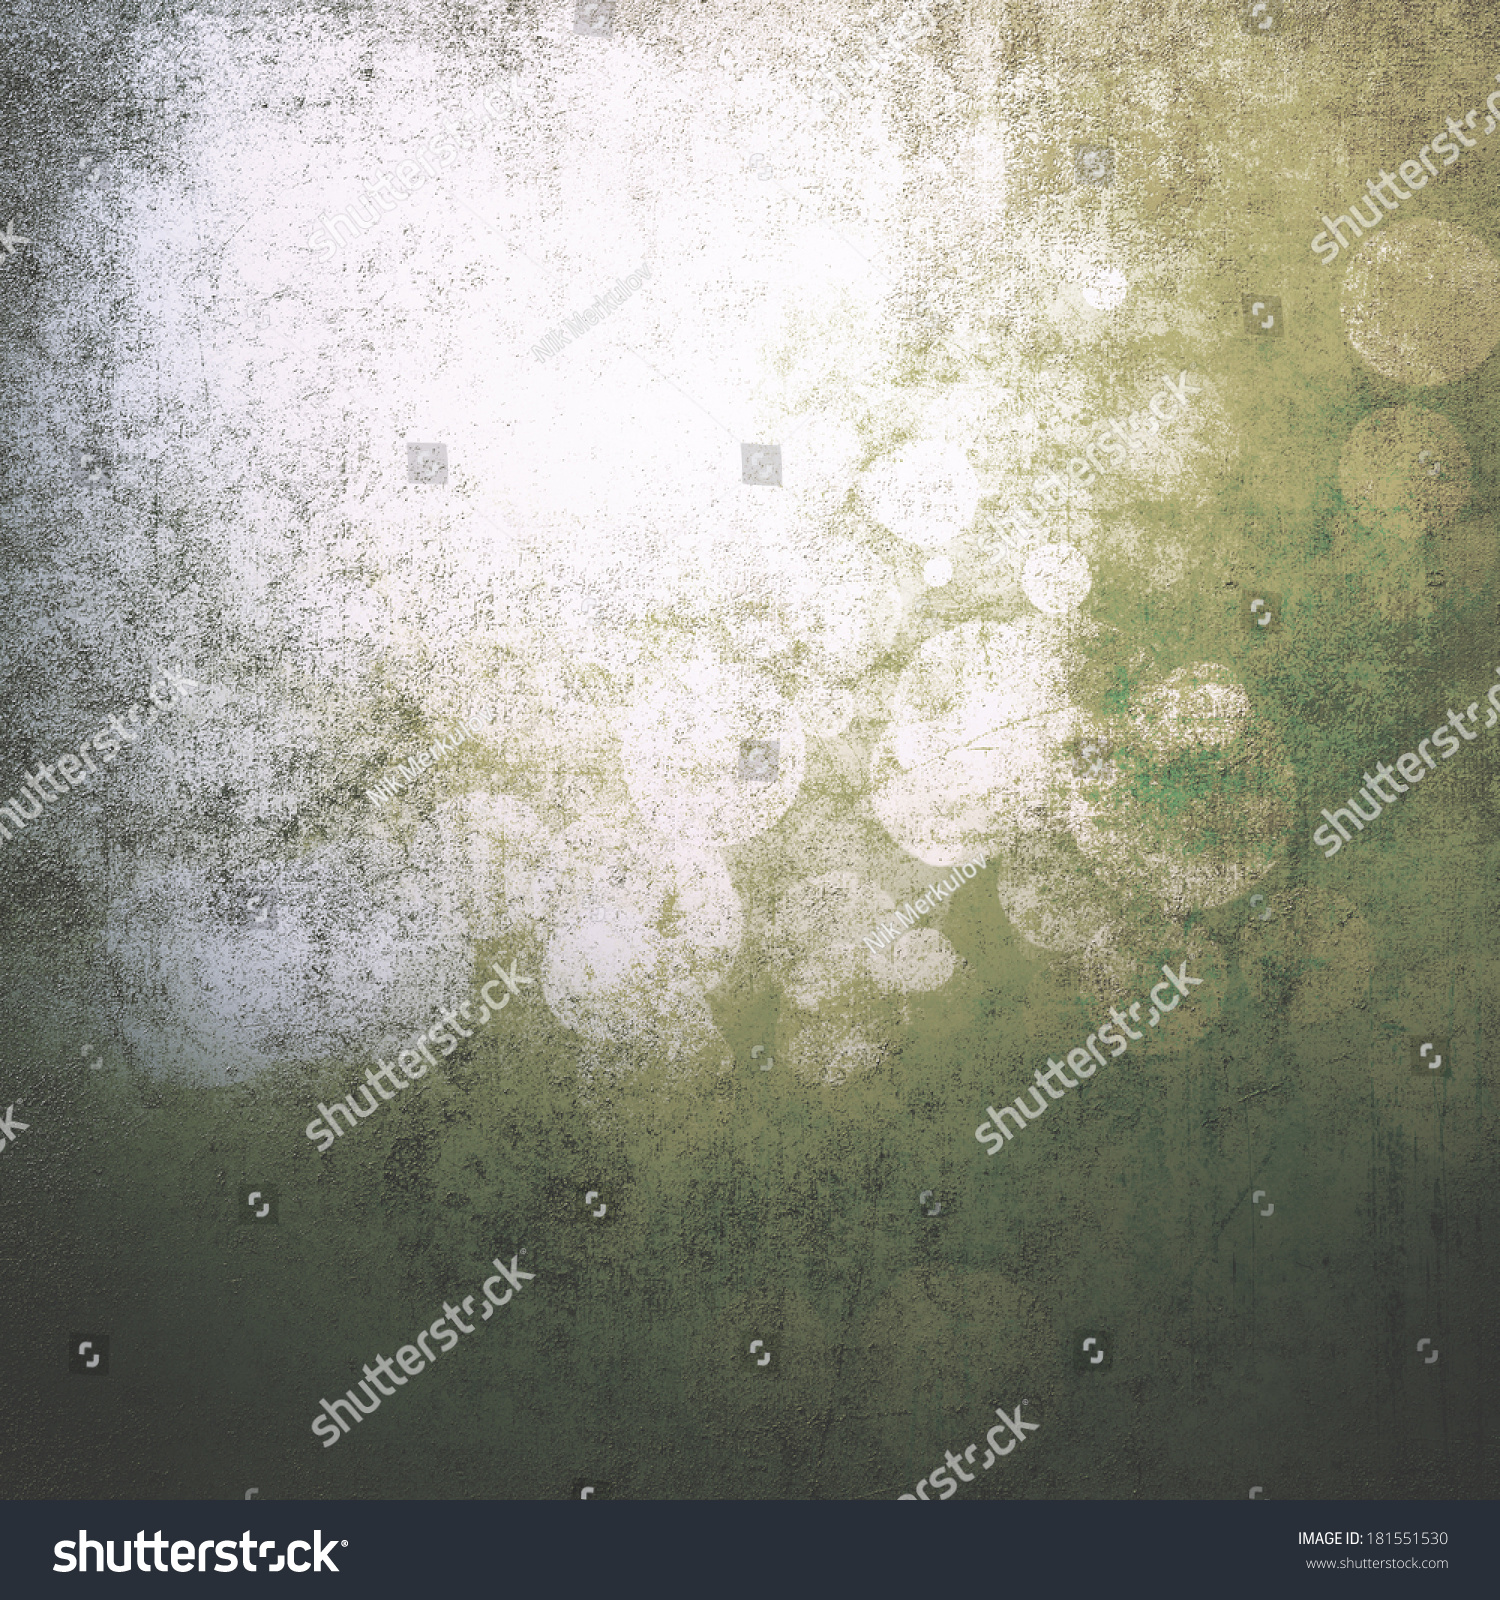 Ergosoft posterprint crack